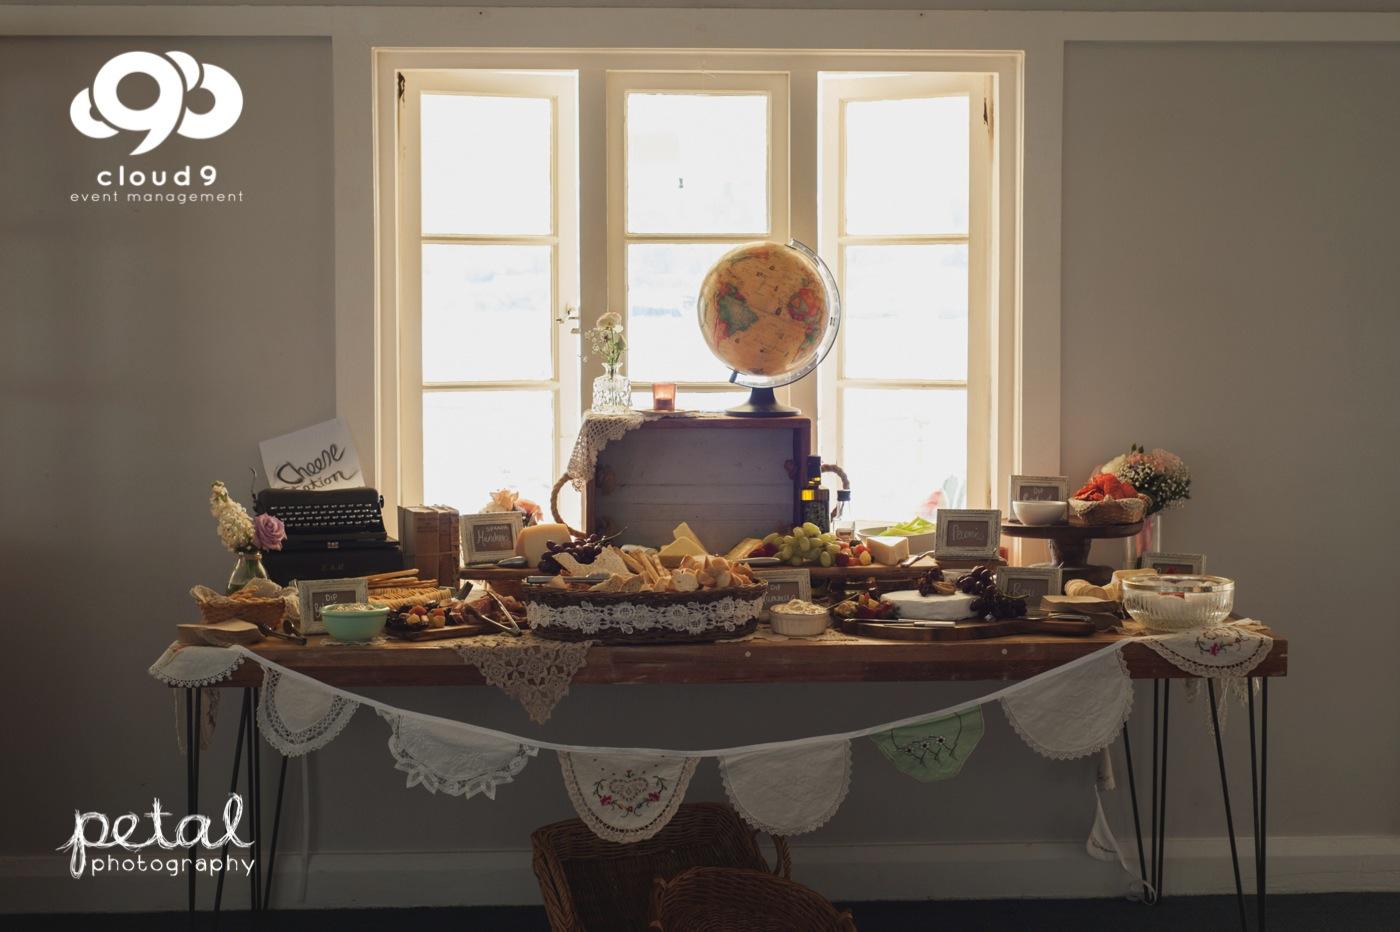 Cheese & cracker station - vintage theme